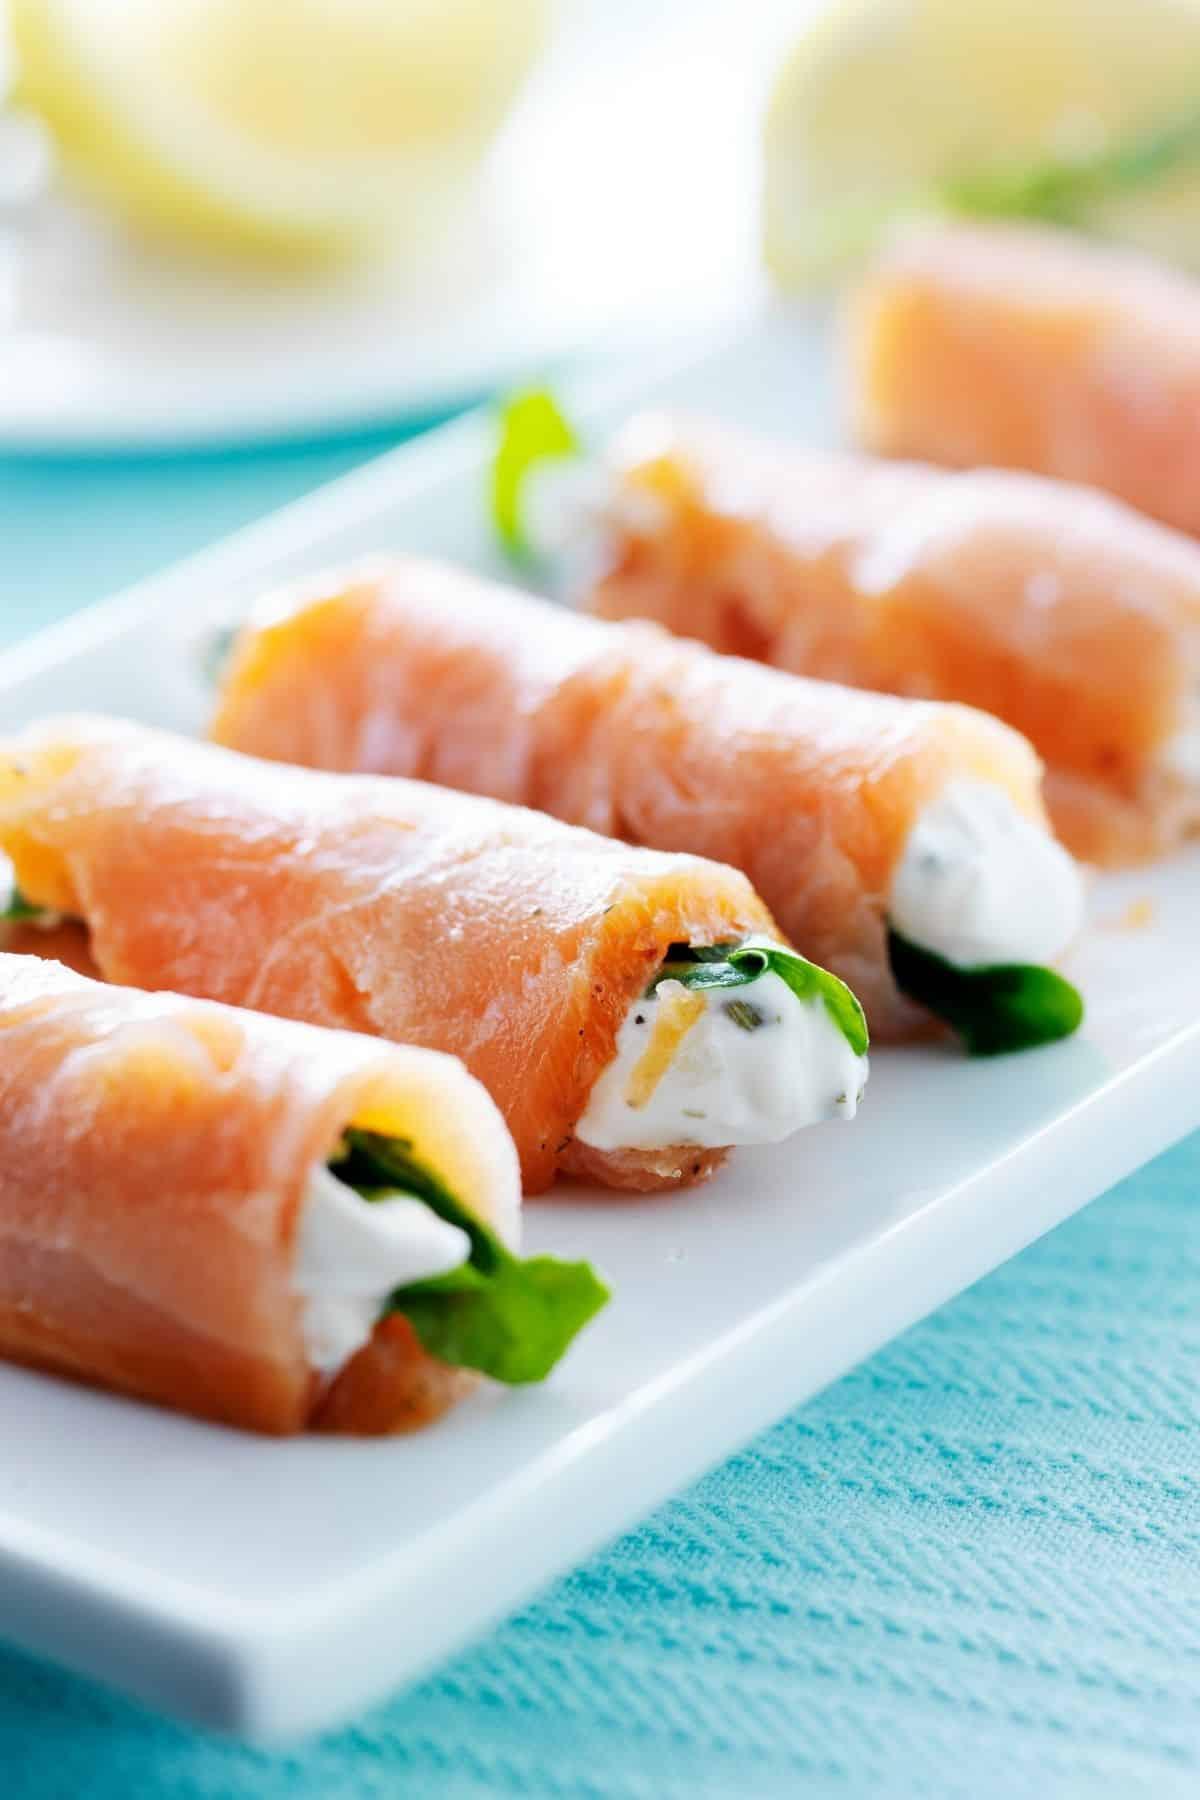 smoked salmon wraps on a plate